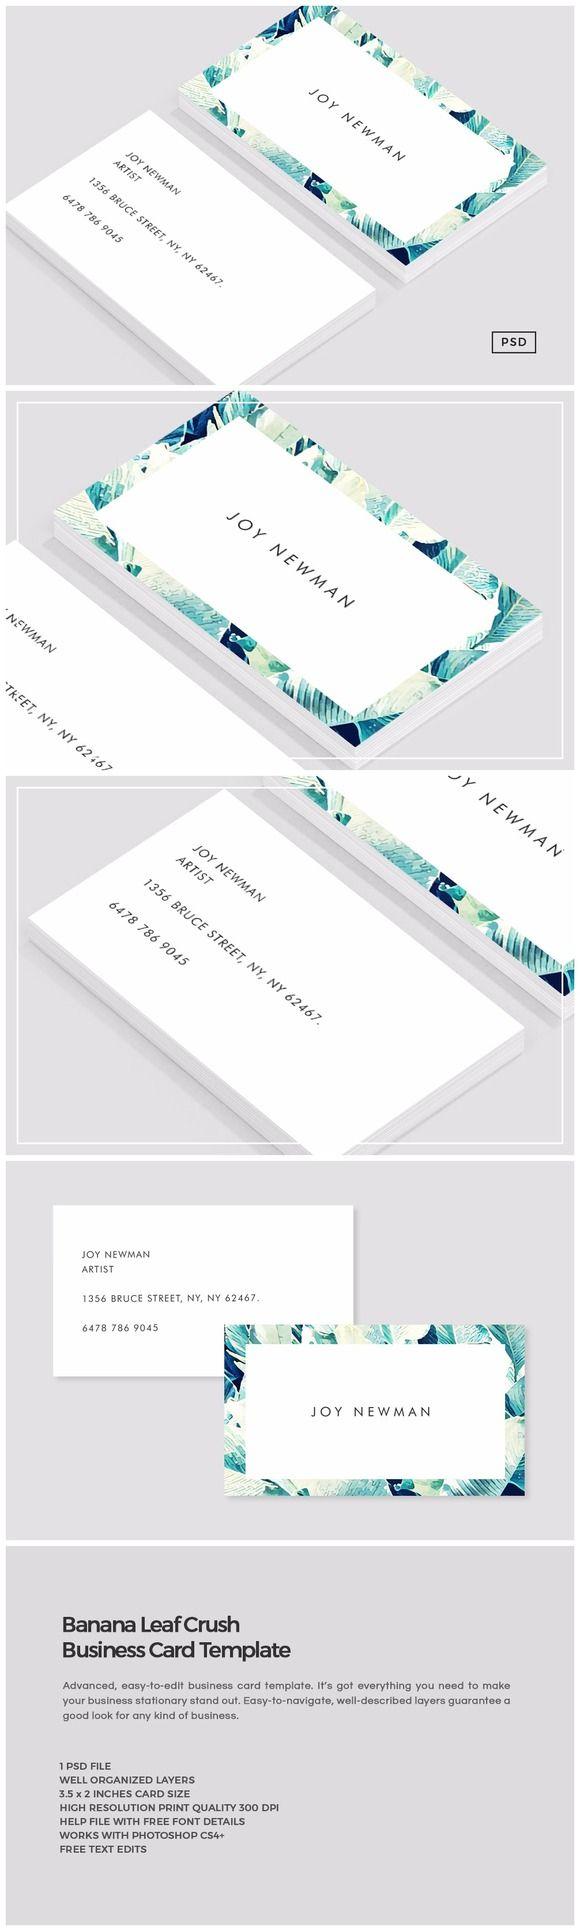 Banana Leaf Crush Business Card  @creativework247